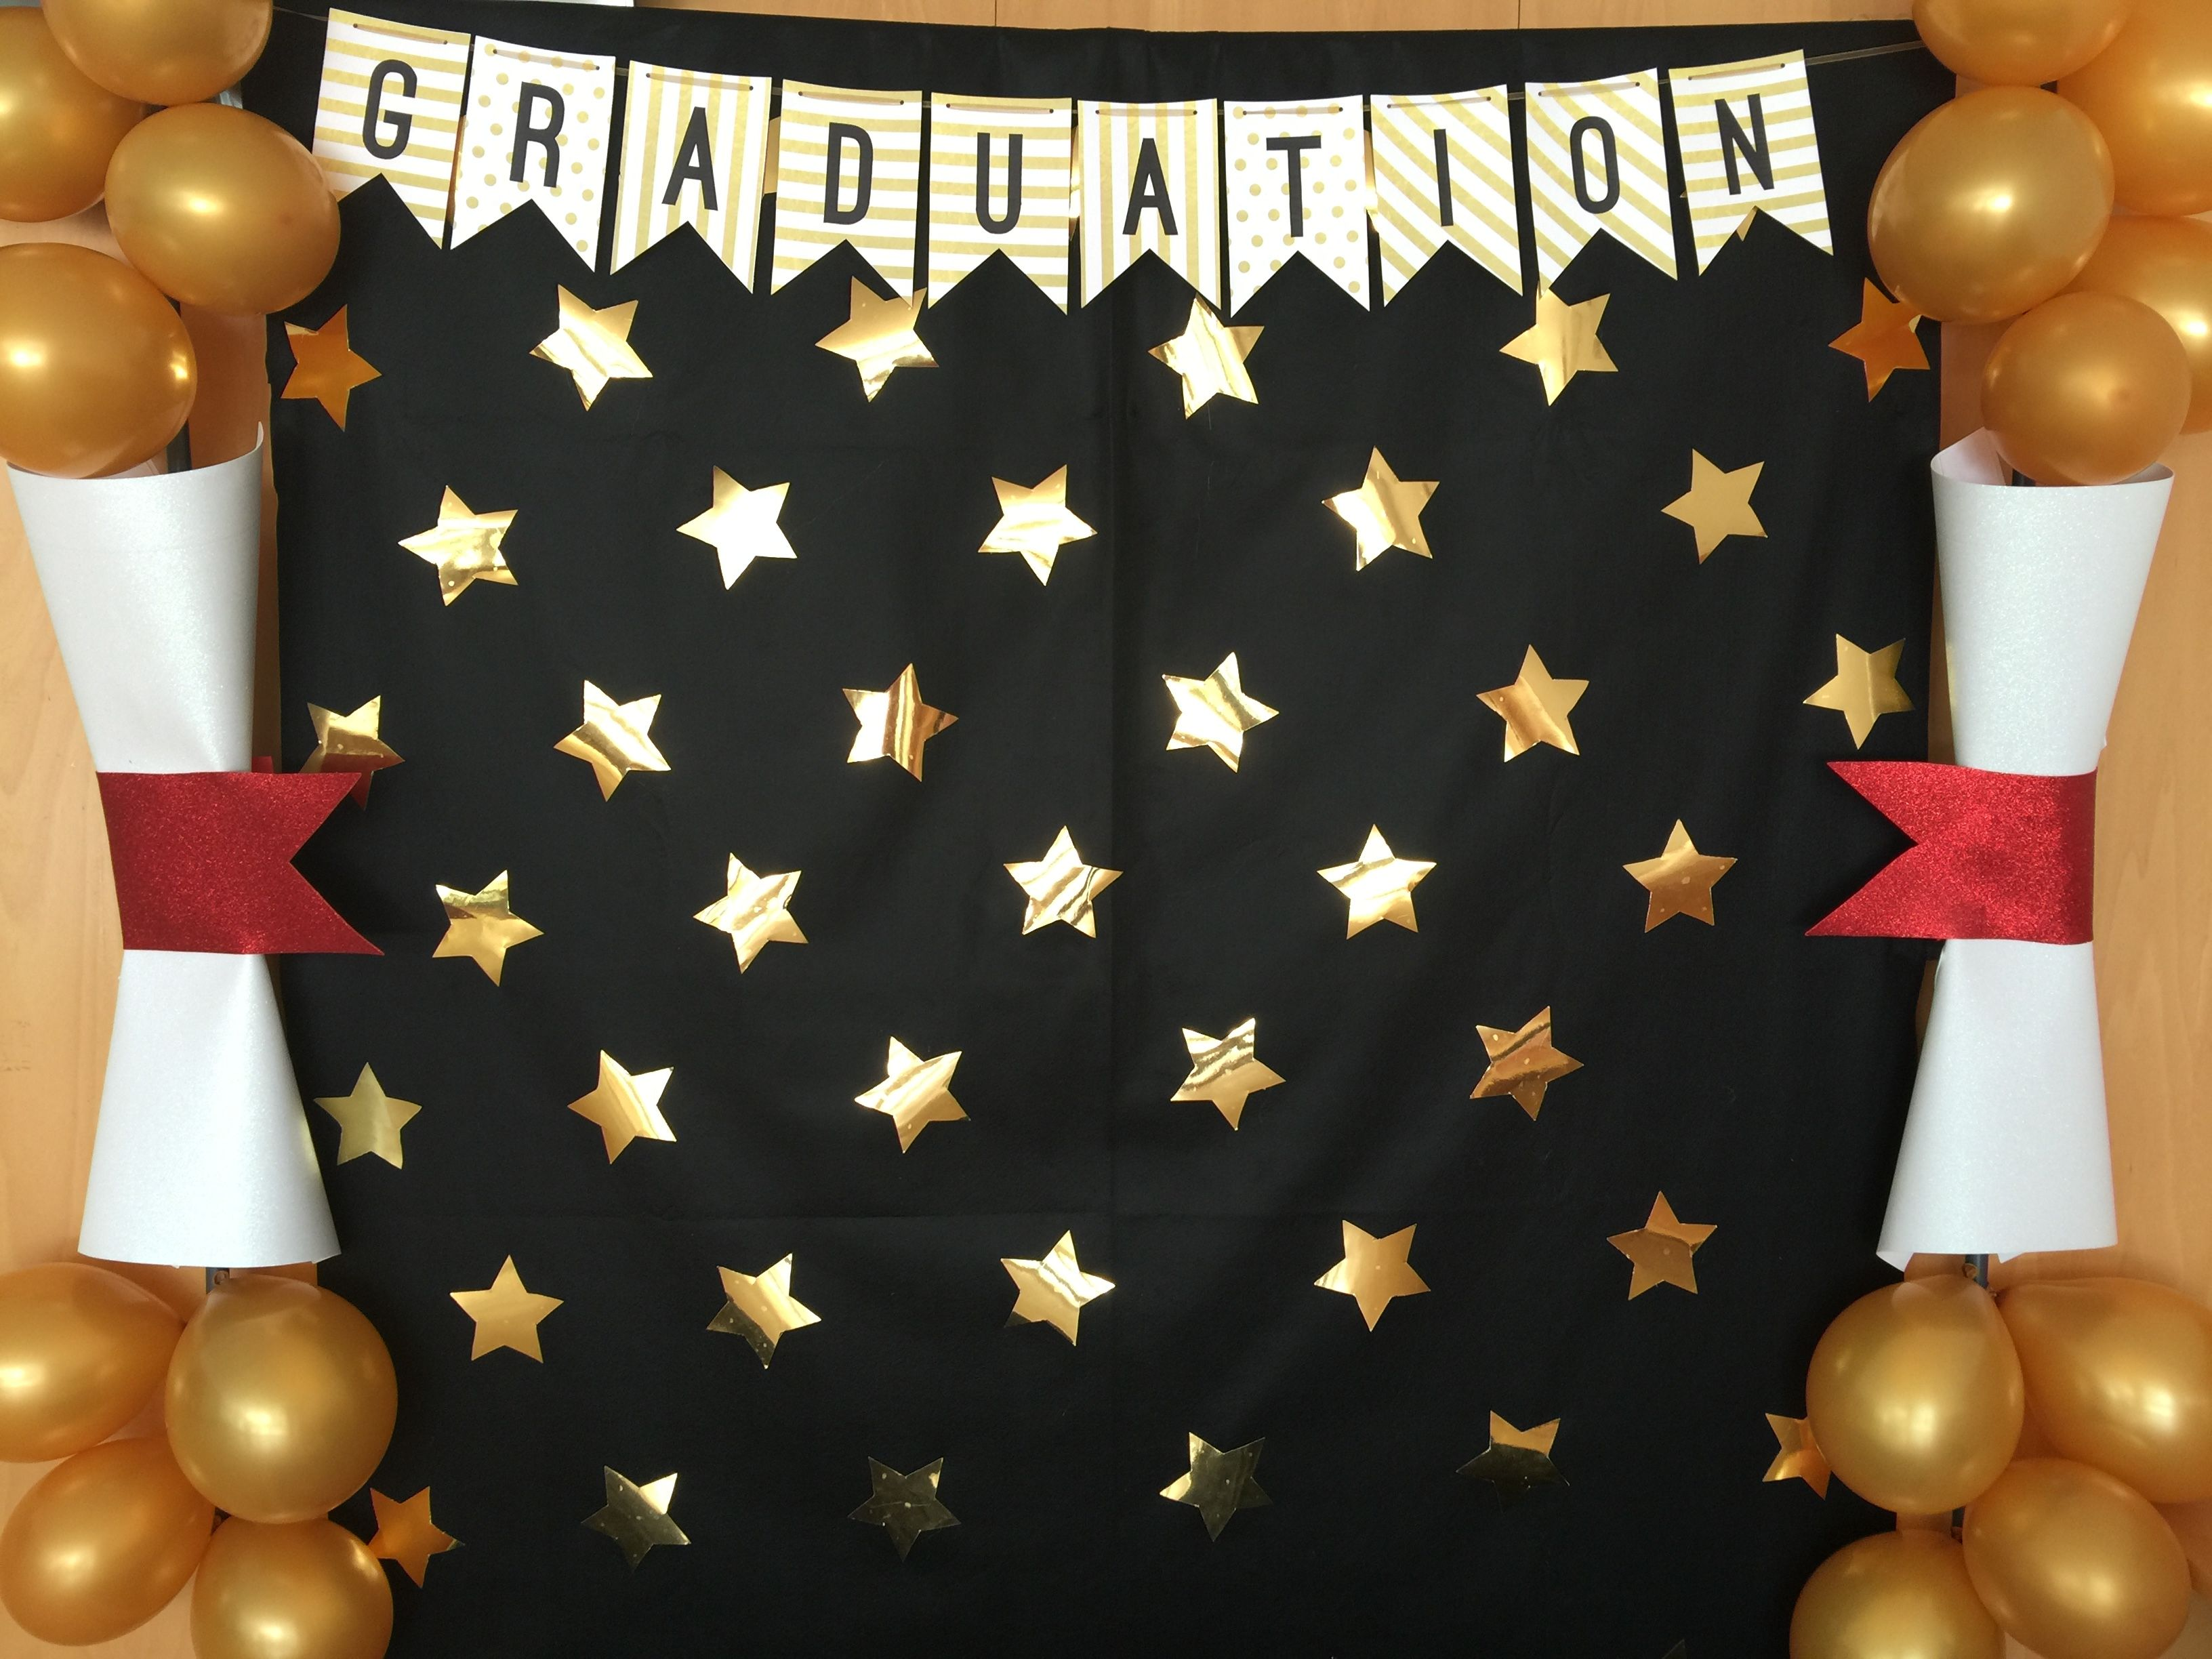 Photocall graduation apapachoa arte ballag s for Decoracion de licenciatura